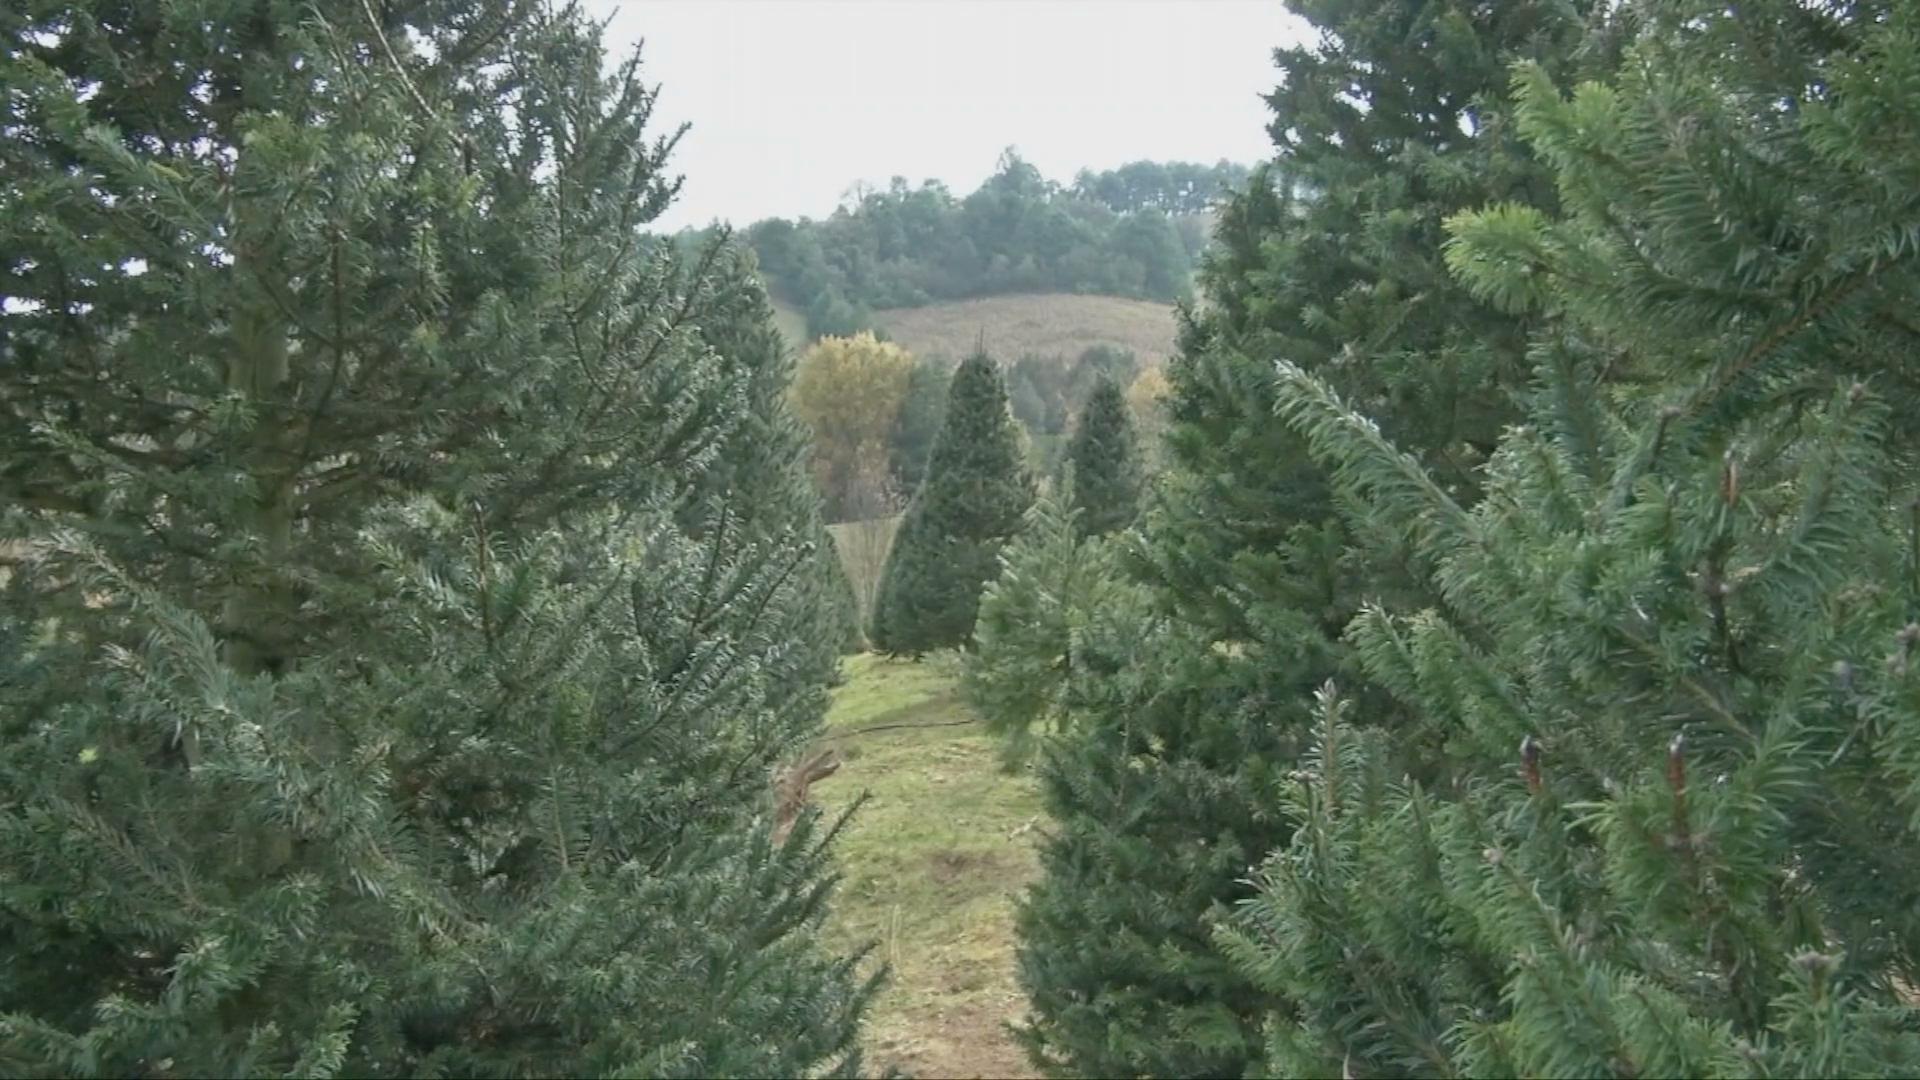 Inicia venta de pinos navideños en Xalapa